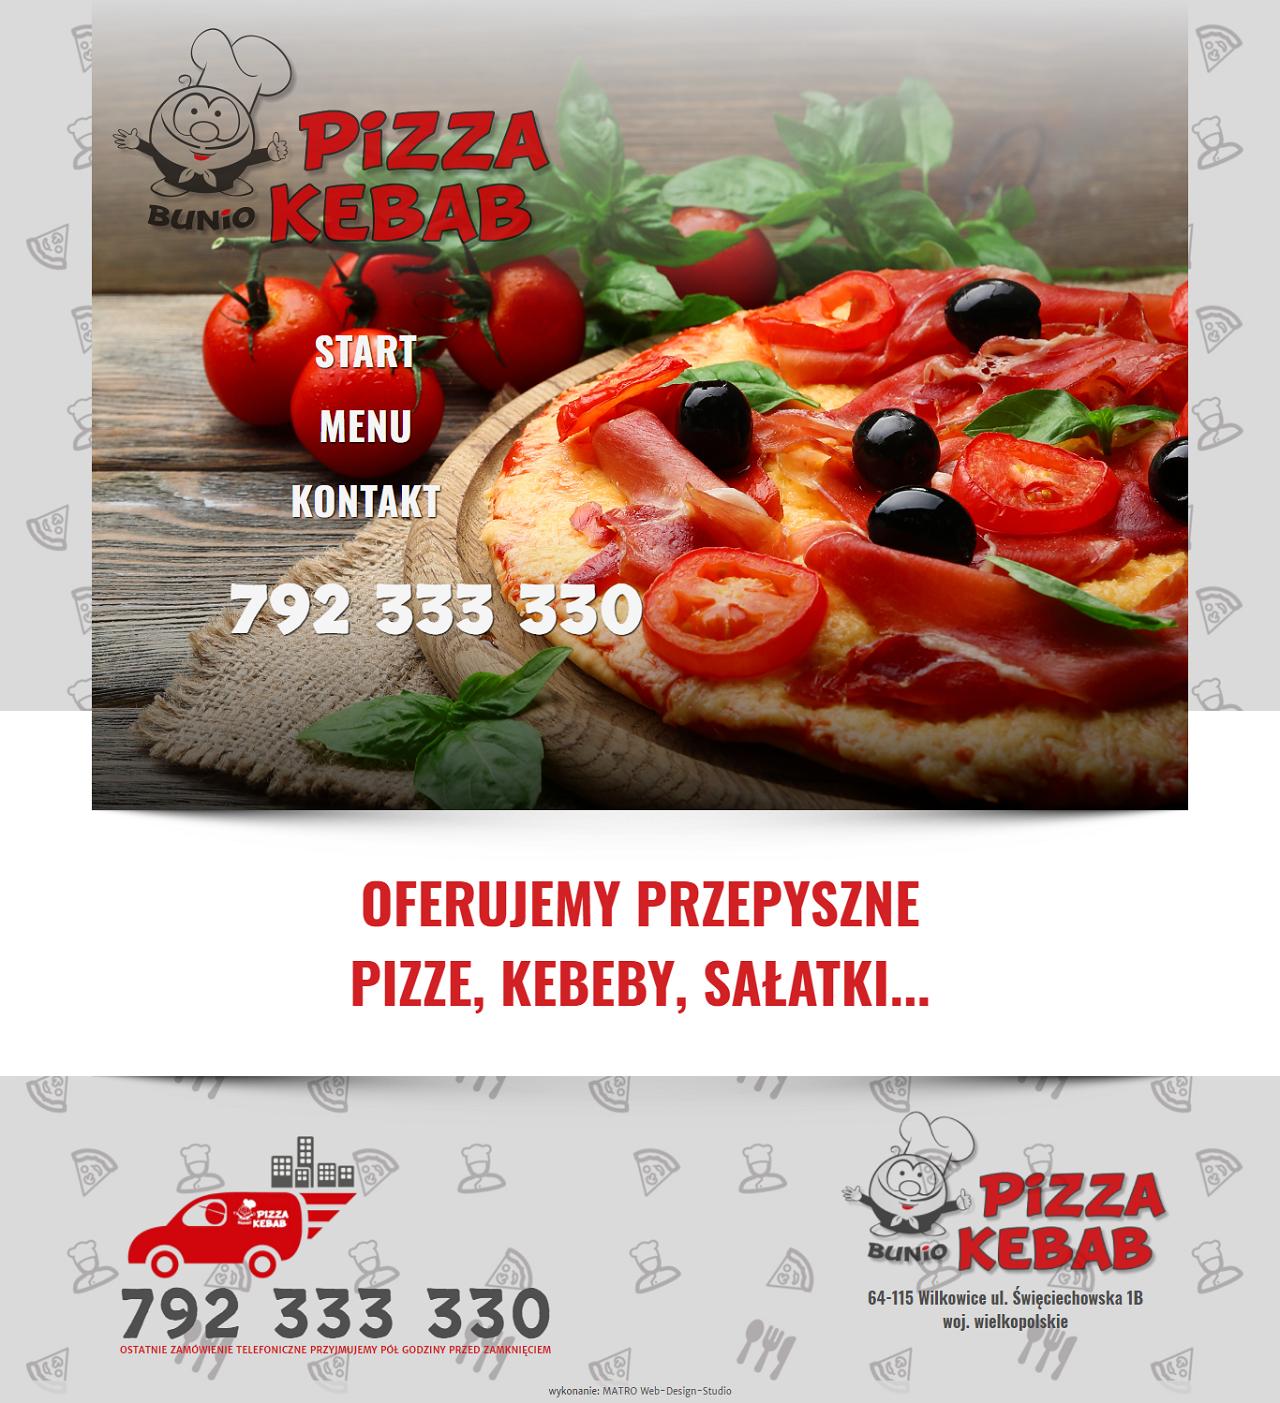 Pizzeria Bunio